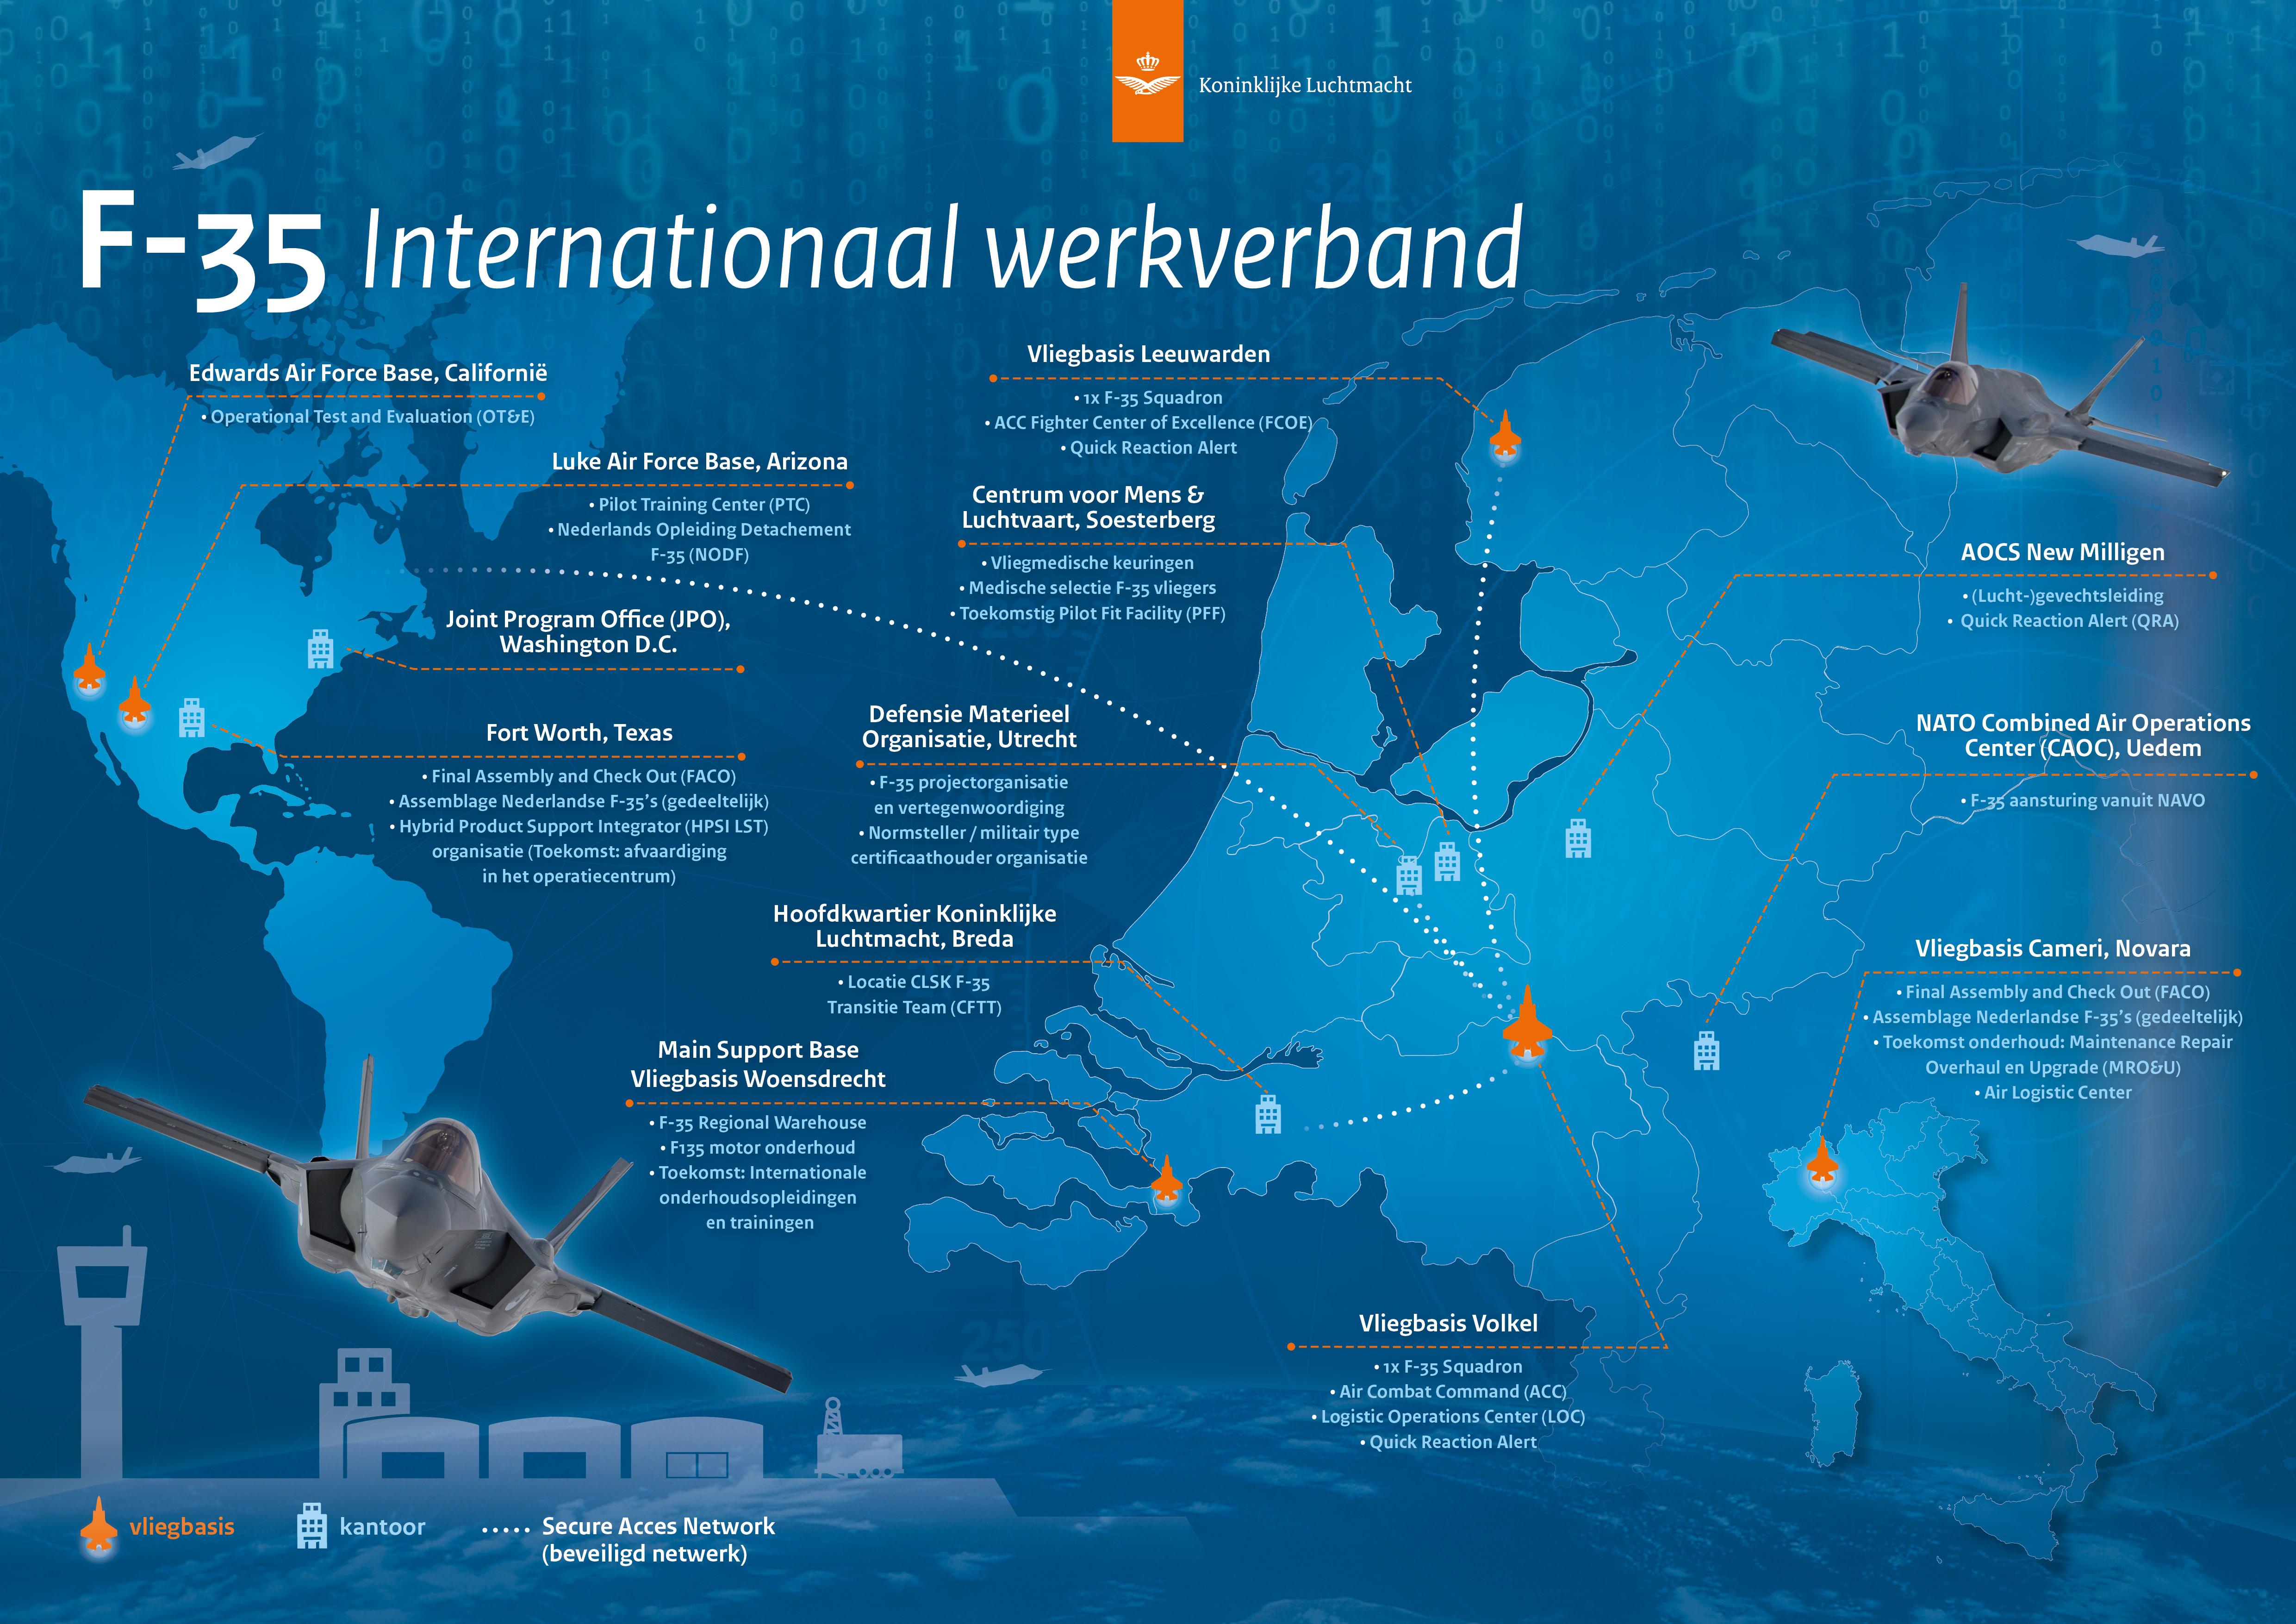 KLu infographic F-35 Lightning II, Internationaal werkverband